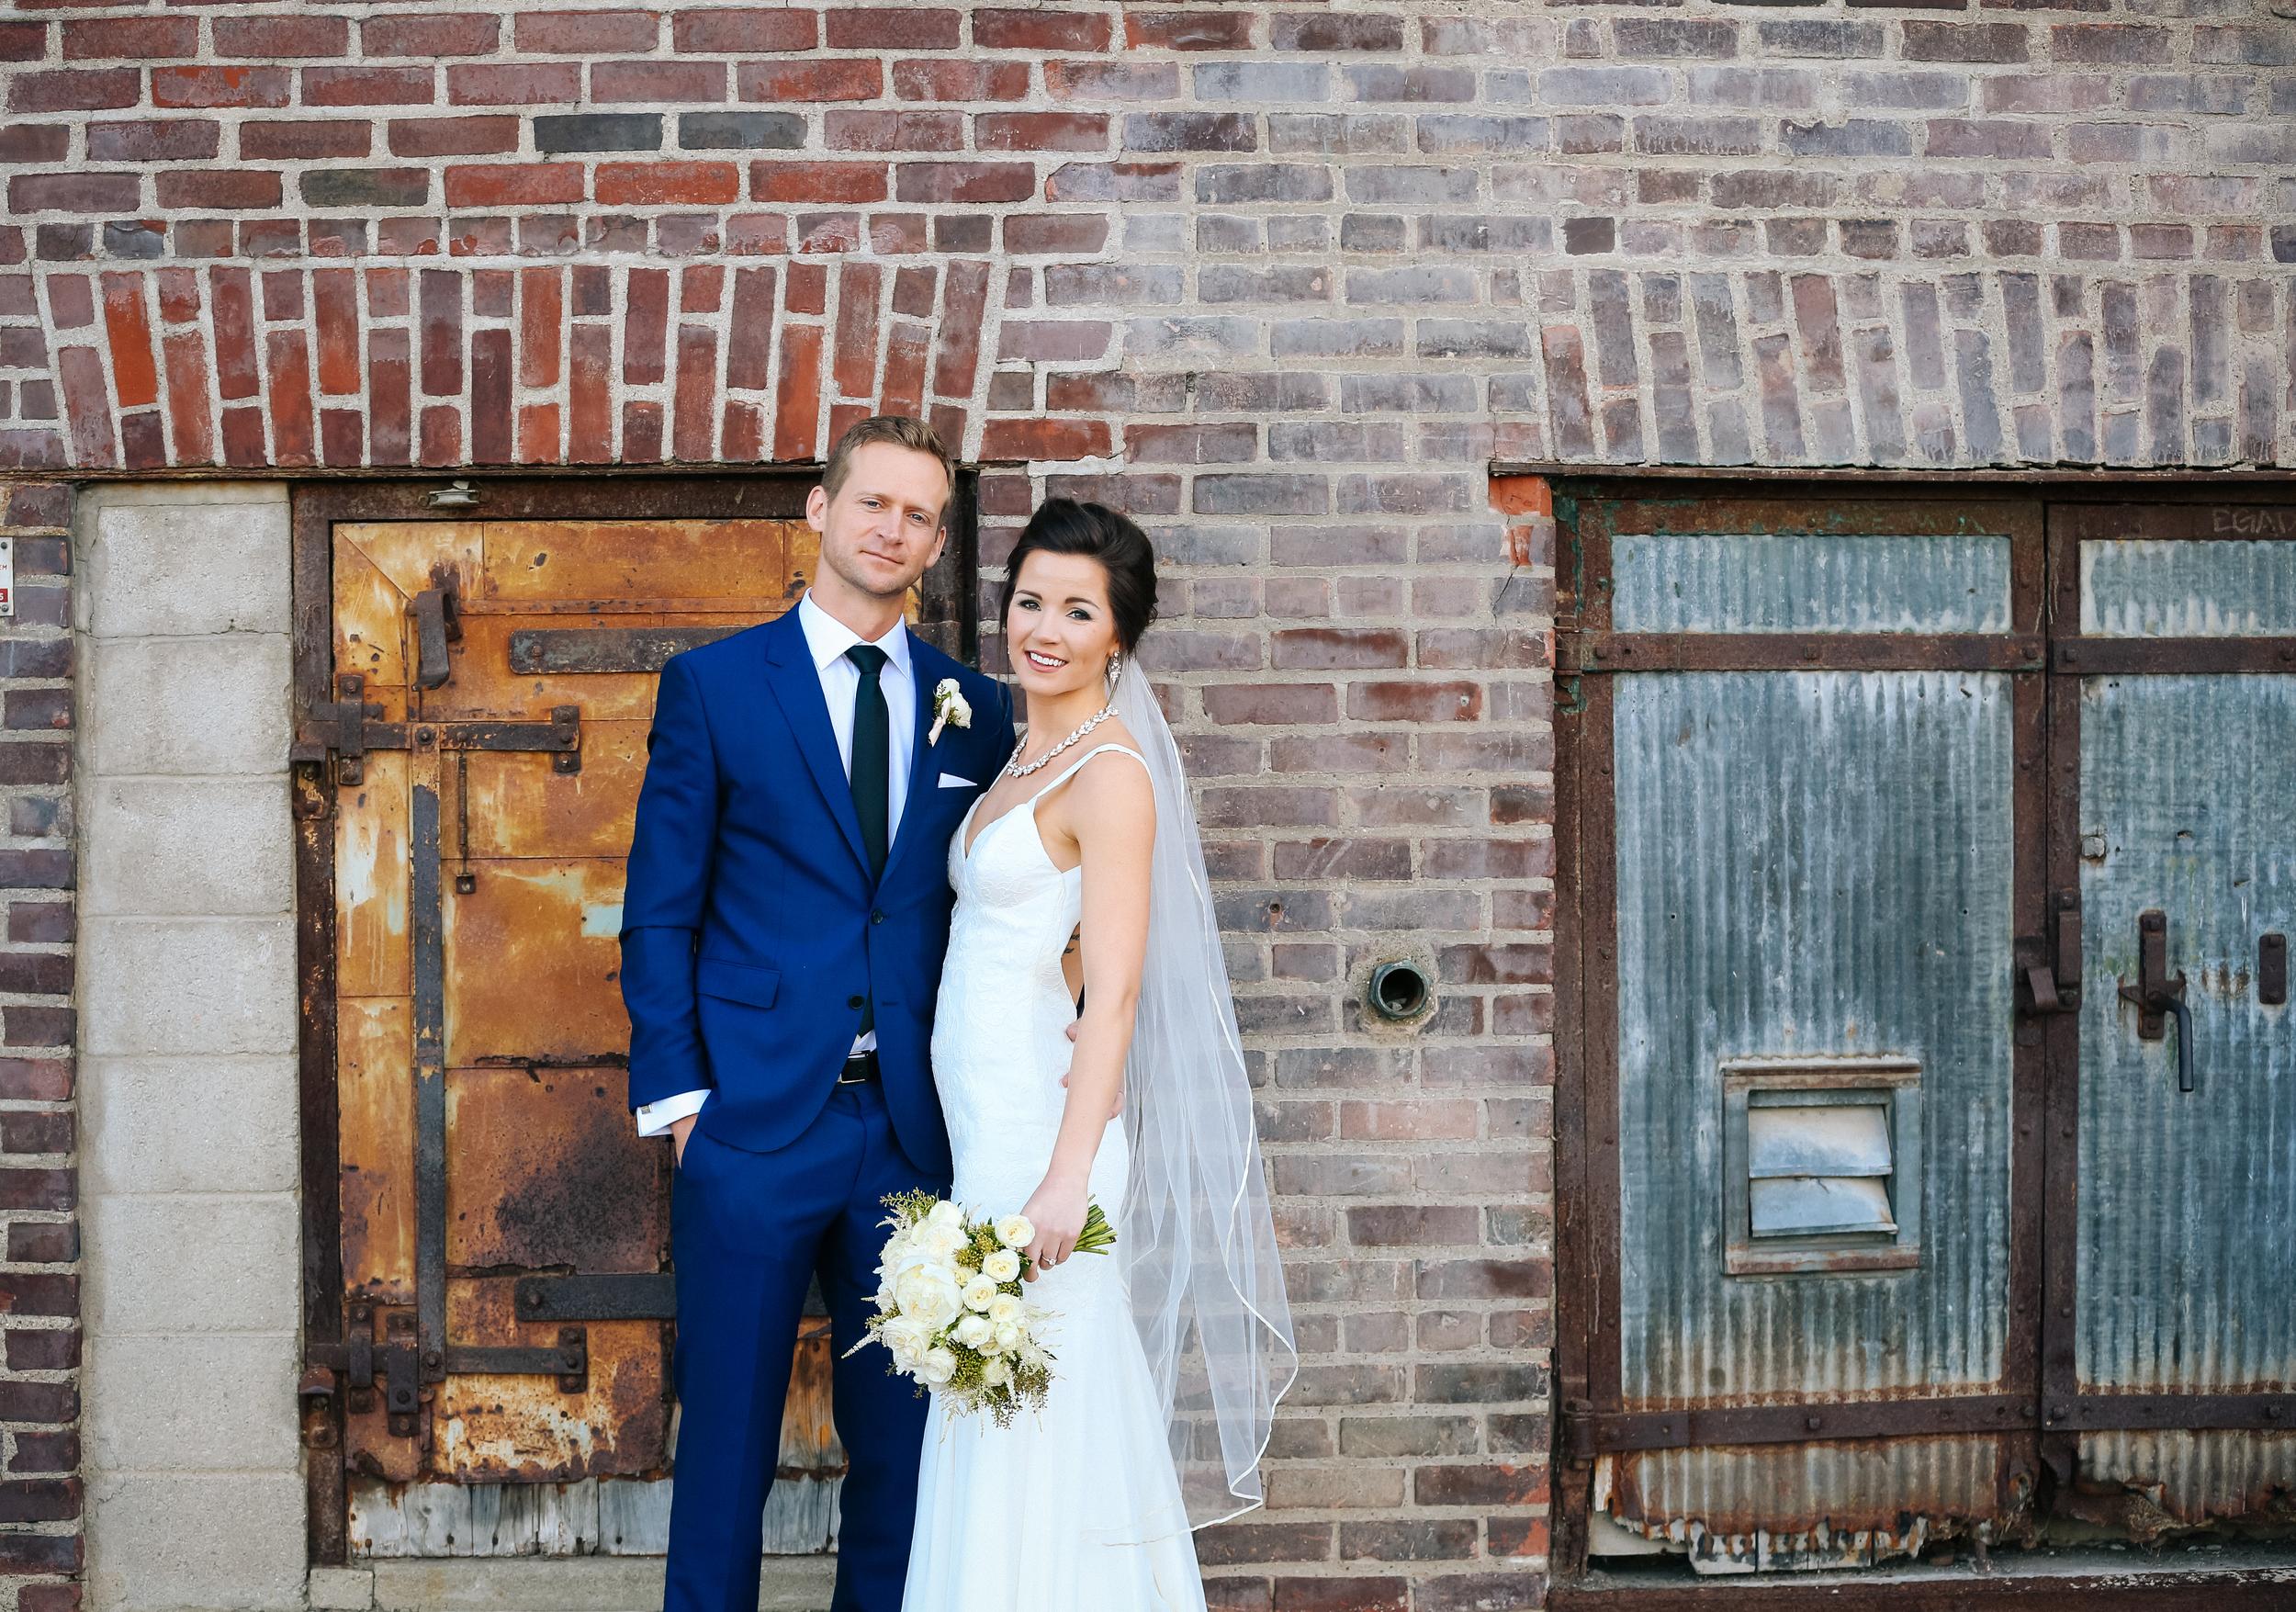 WeddingWebsite-2.jpg